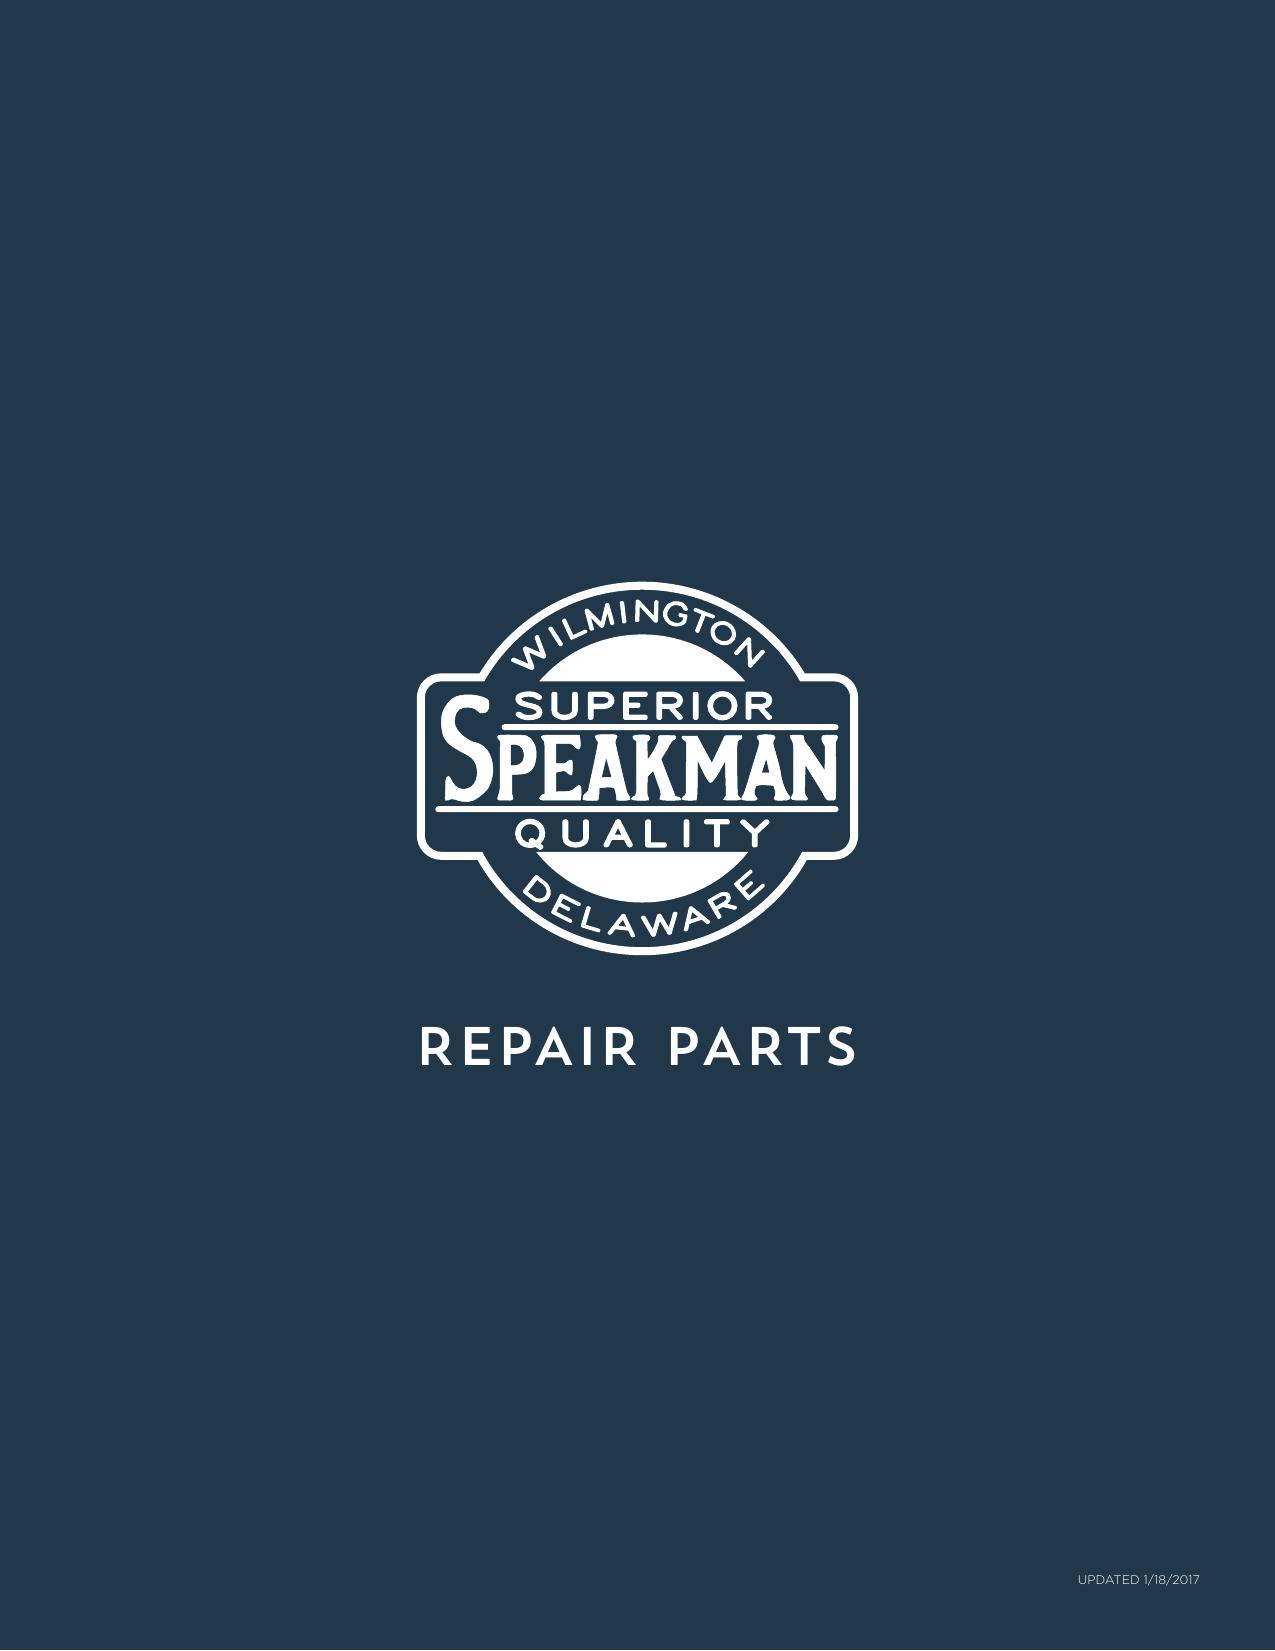 Sb-1211S Speakman RPG45-0048 Mounting Hardware for Caspian Single Lever Faucet